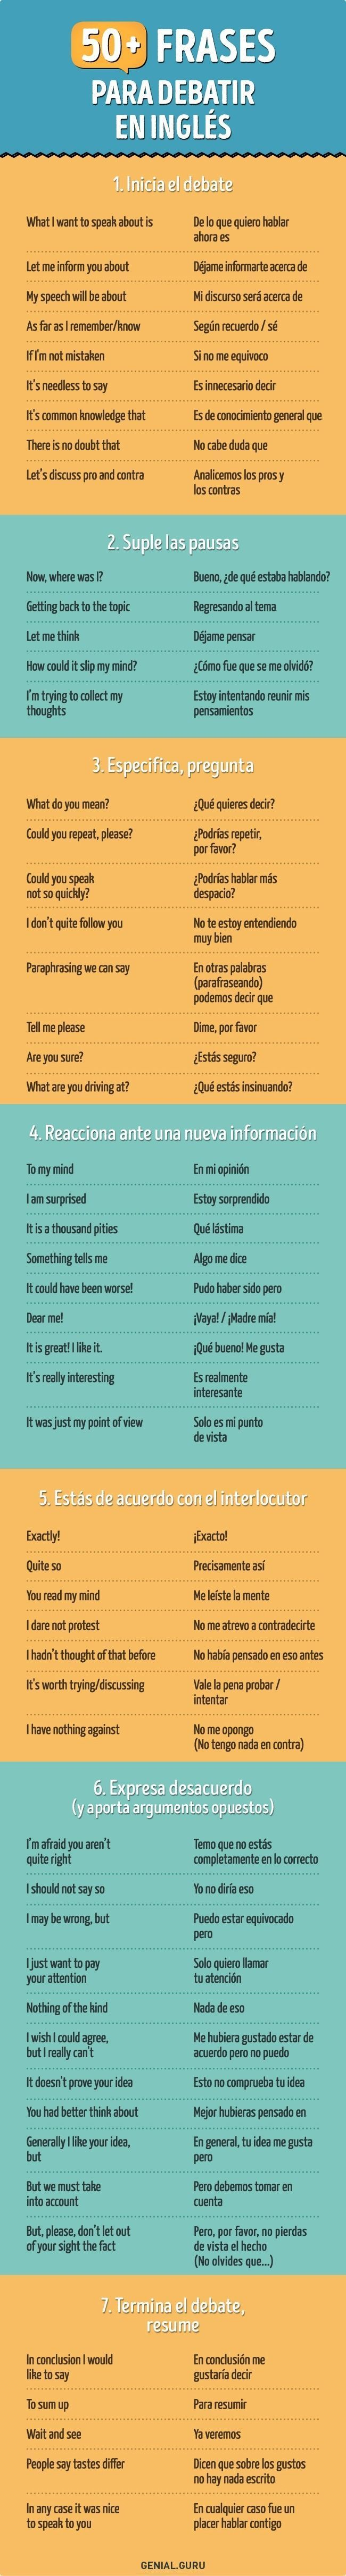 Advanced Spanish Lessons   Frases, Idiomas y Aprender inglés